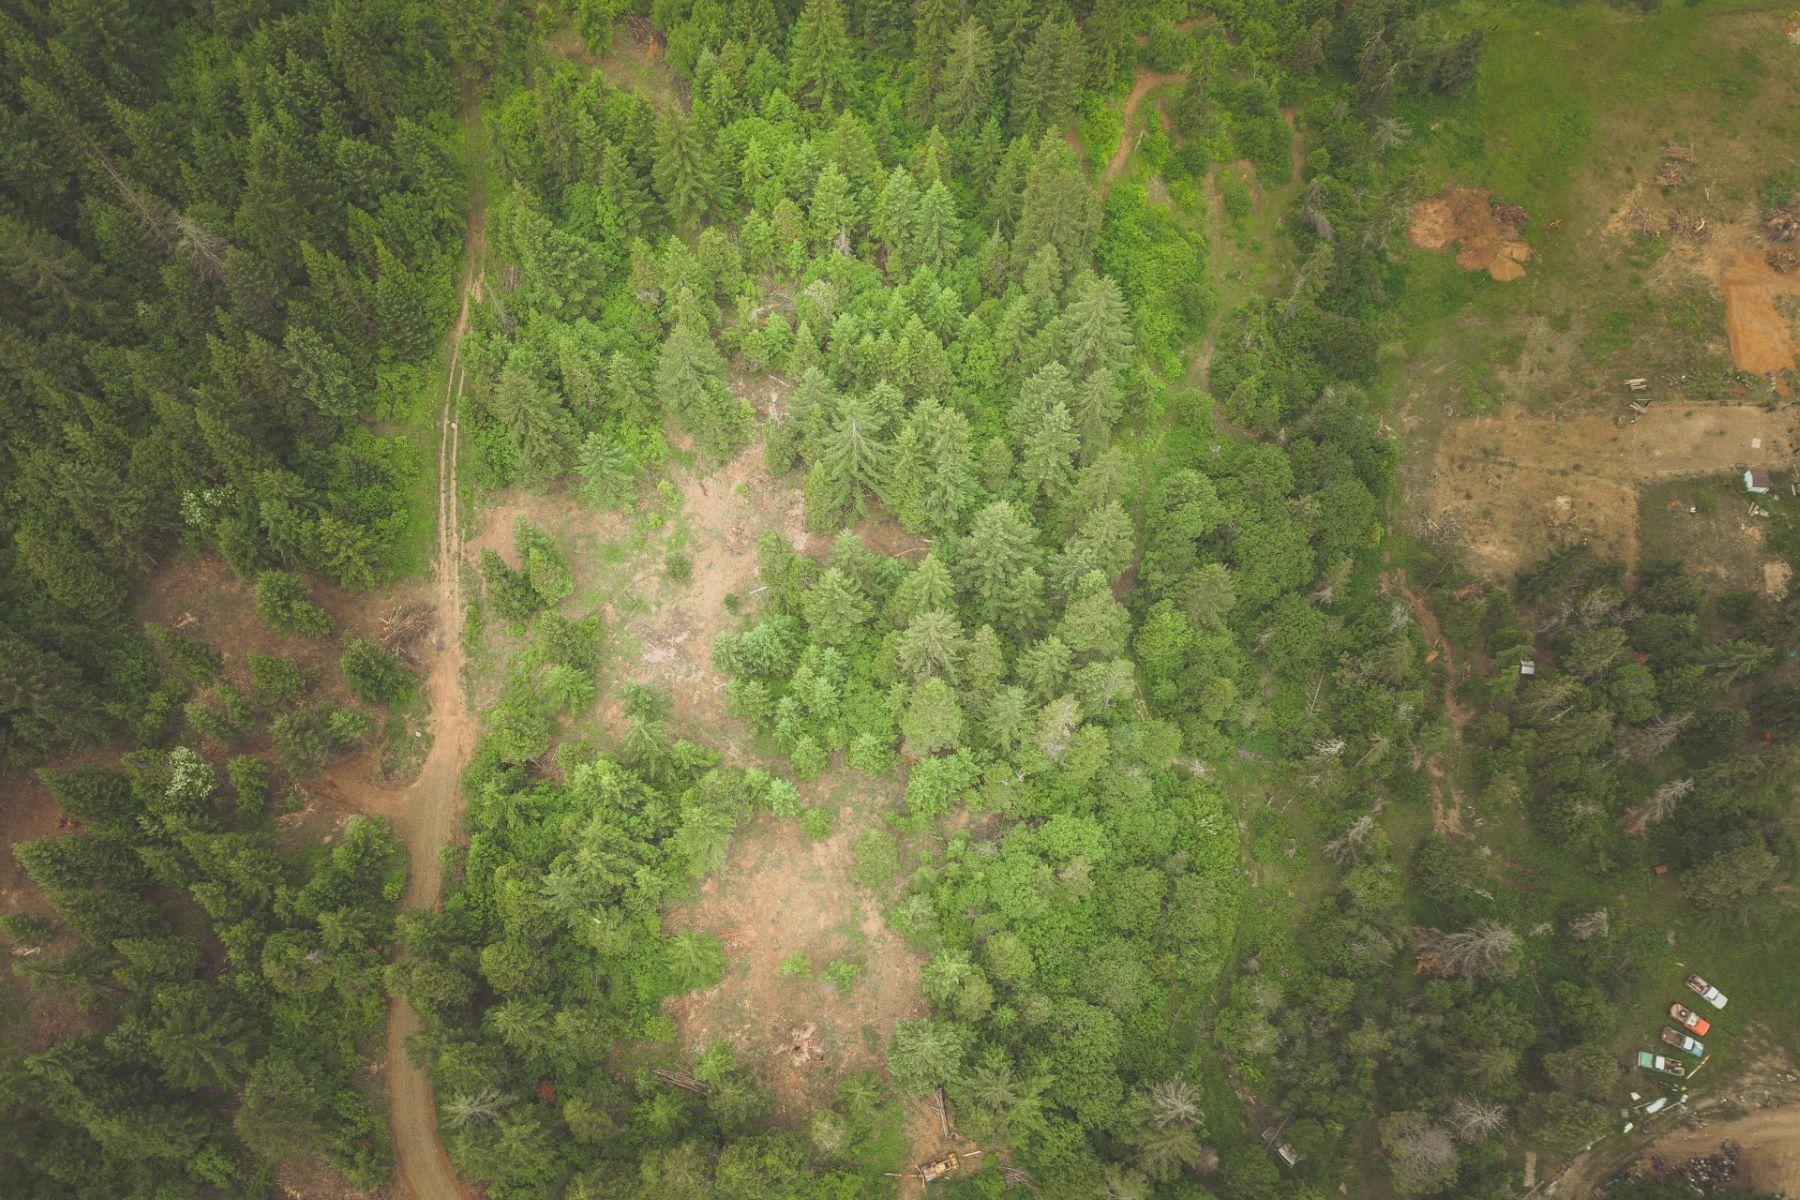 Land for Sale at Lot 300 Kida Road White Salmon, Washington 98672 United States